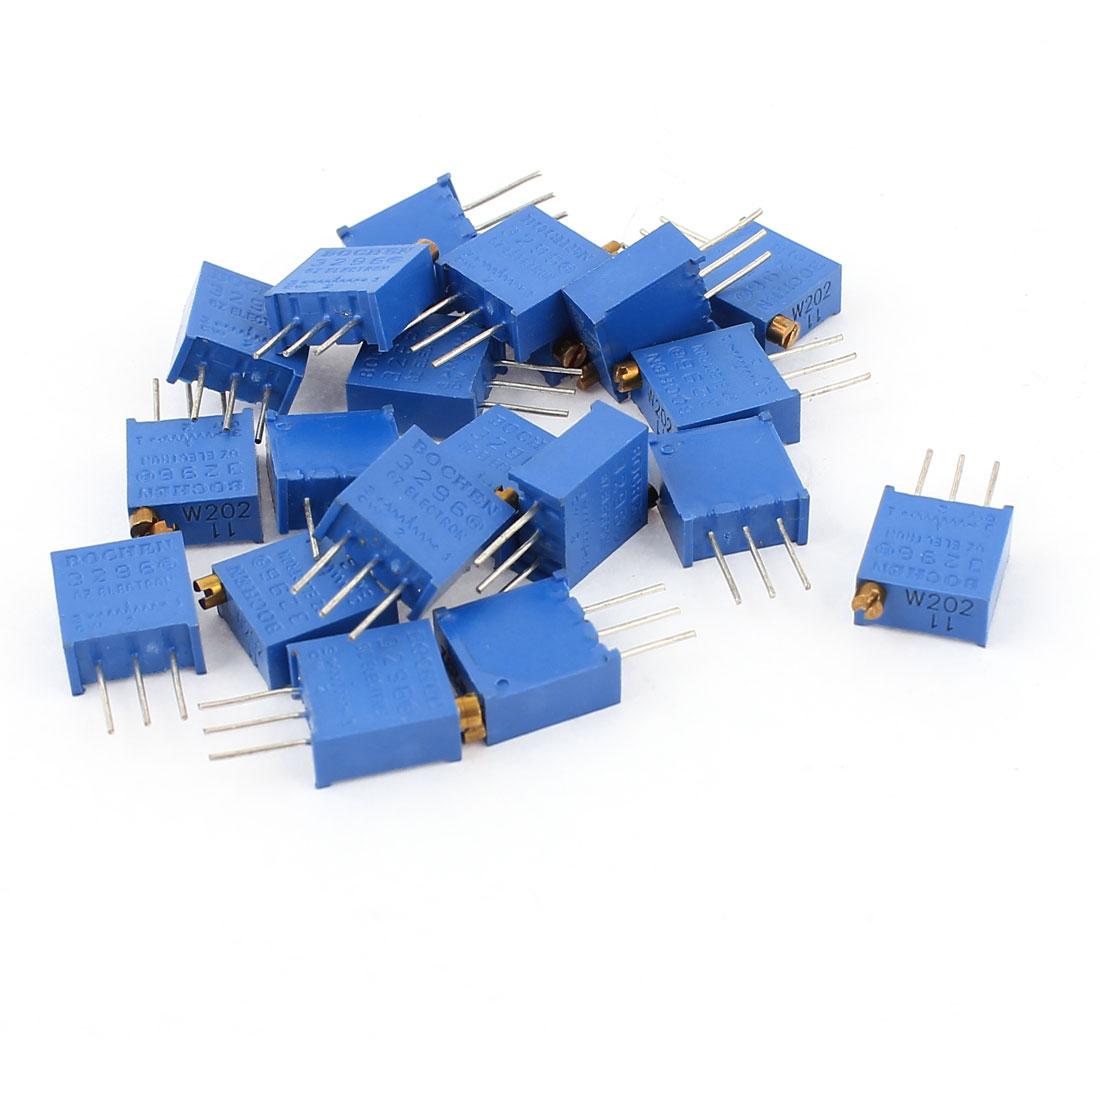 20Pcs 20K Ohm 3296W-202 Resistor Trim Pot Potentiometer Trimmer Blue